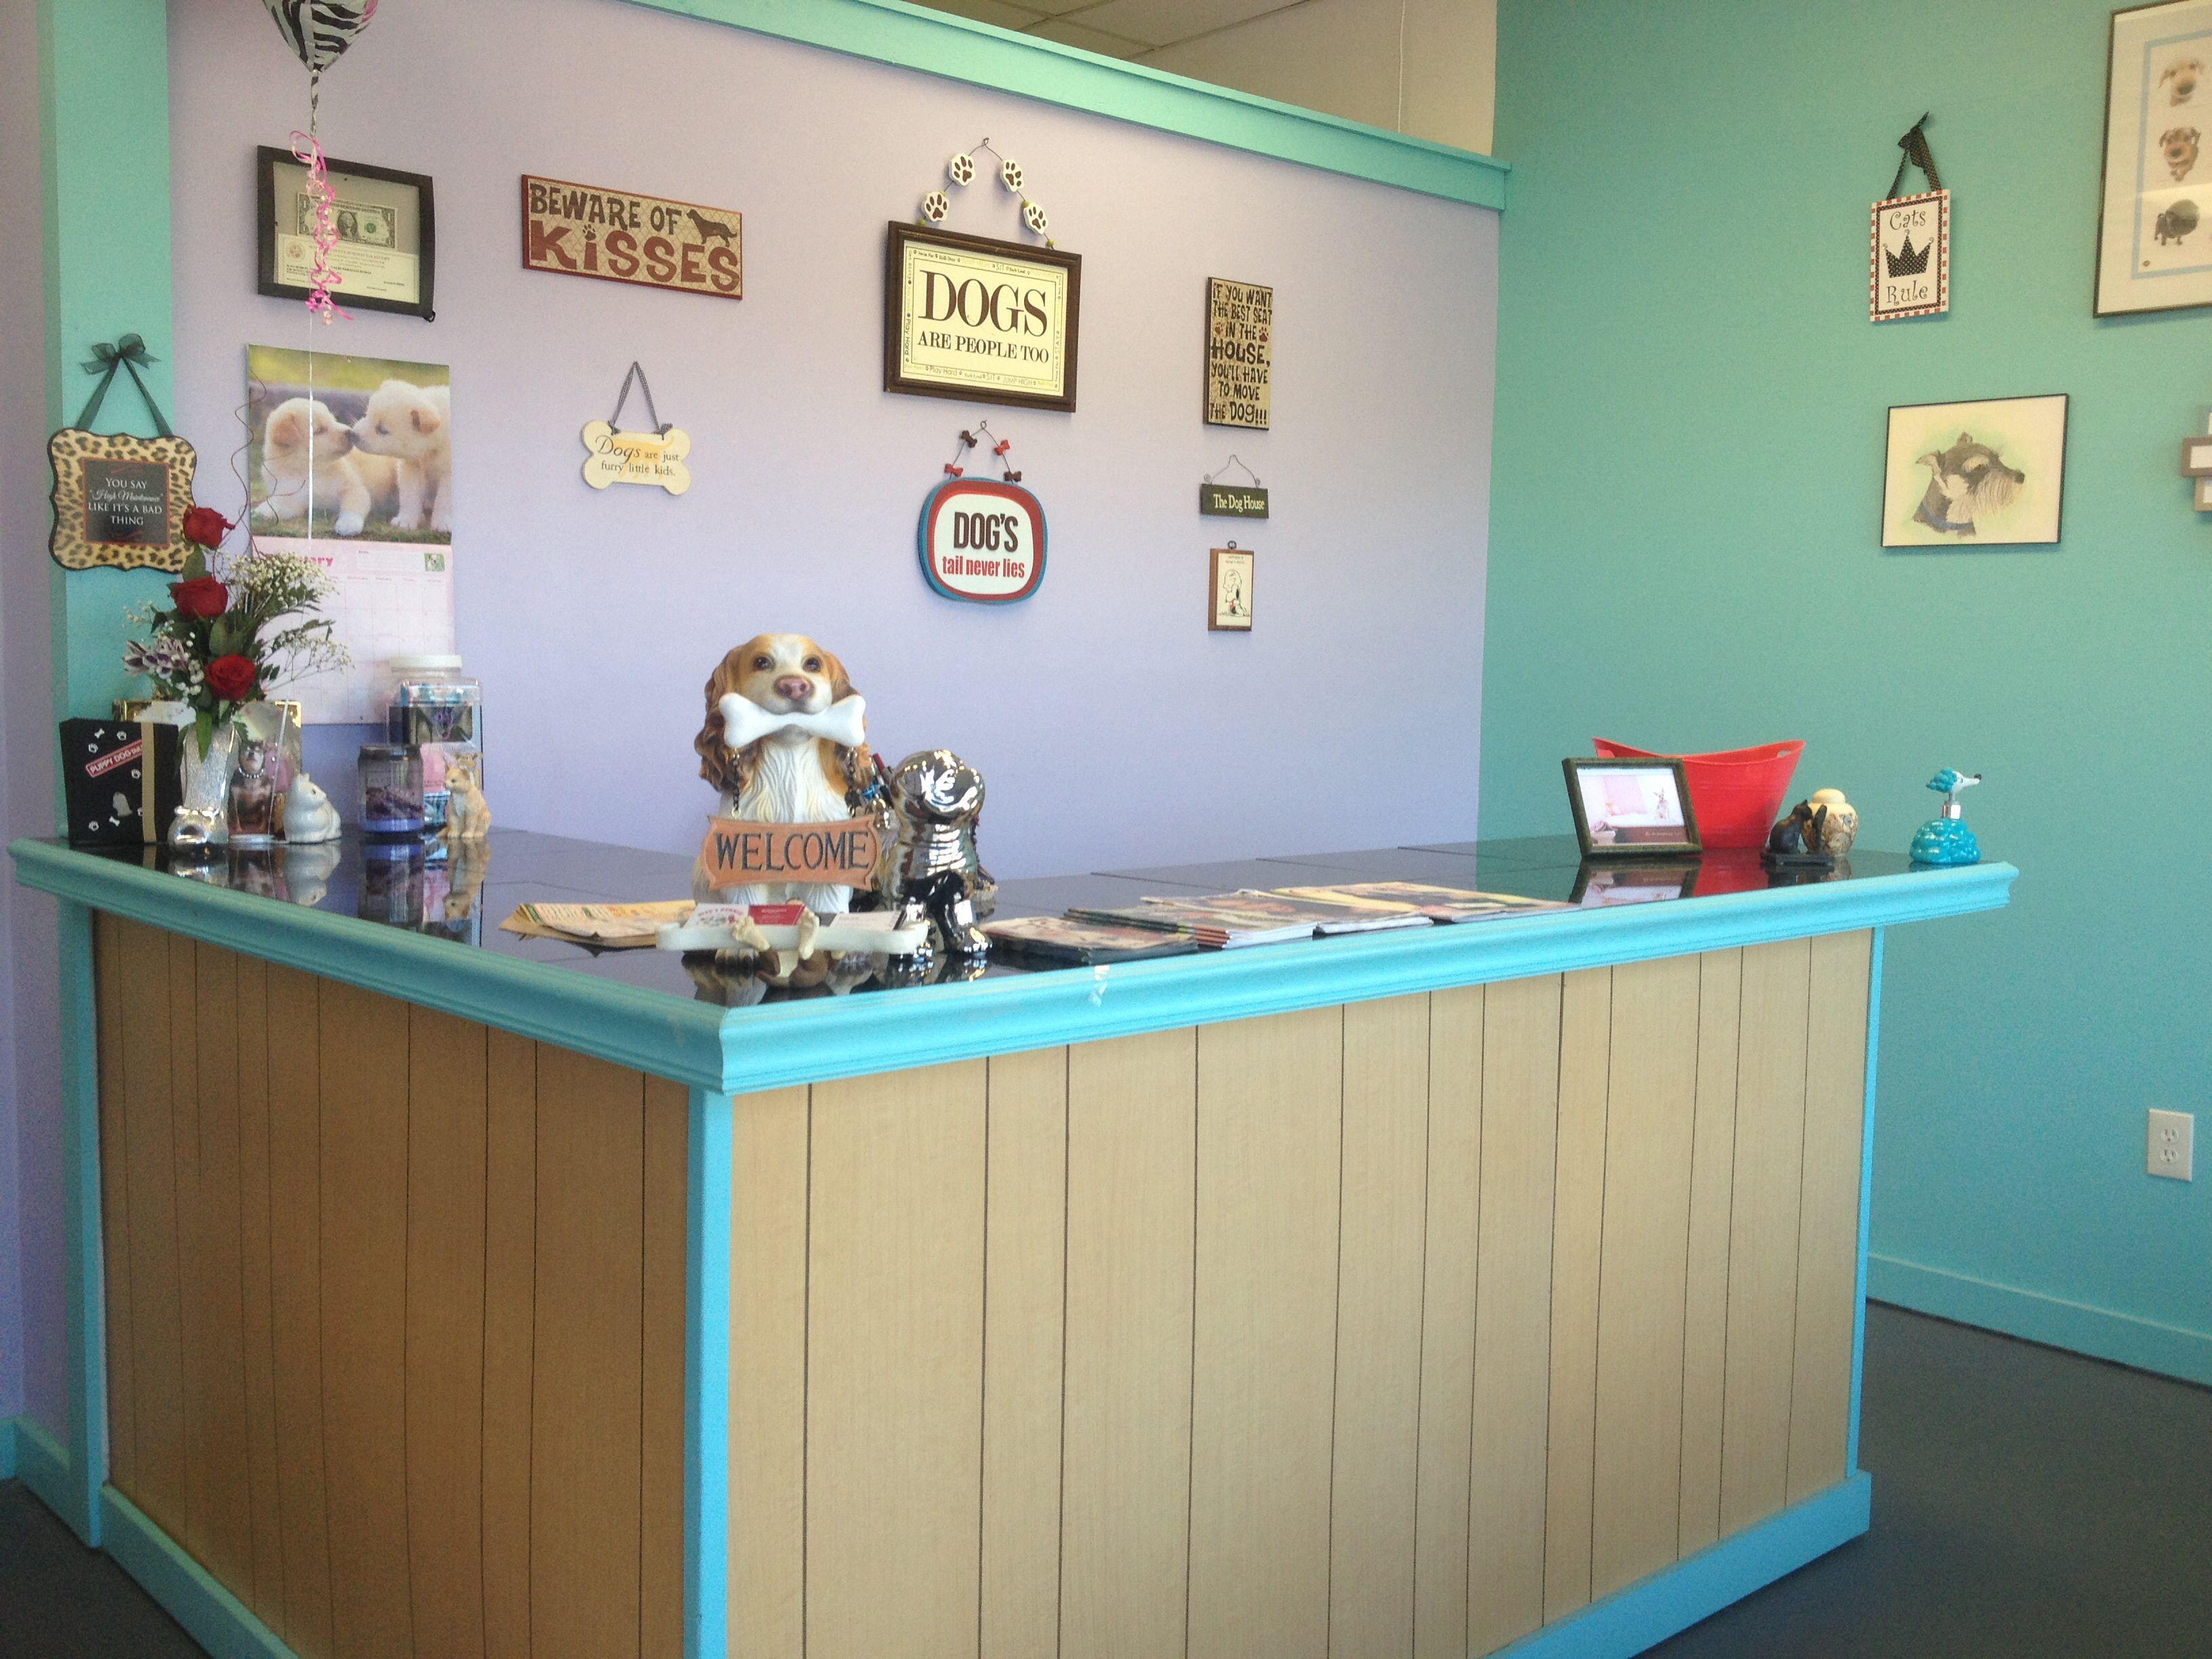 Pin by gisela lorenzati on Pet salon ideas  Dog grooming shop